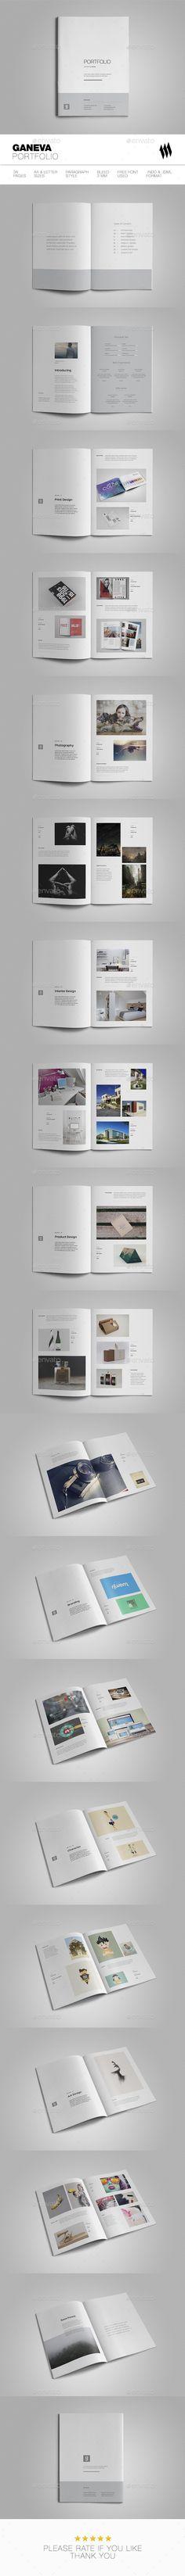 Geneva Portfolio Brochure Tempalte InDesign INDD - 38 Pages, A4 & Letter sizes